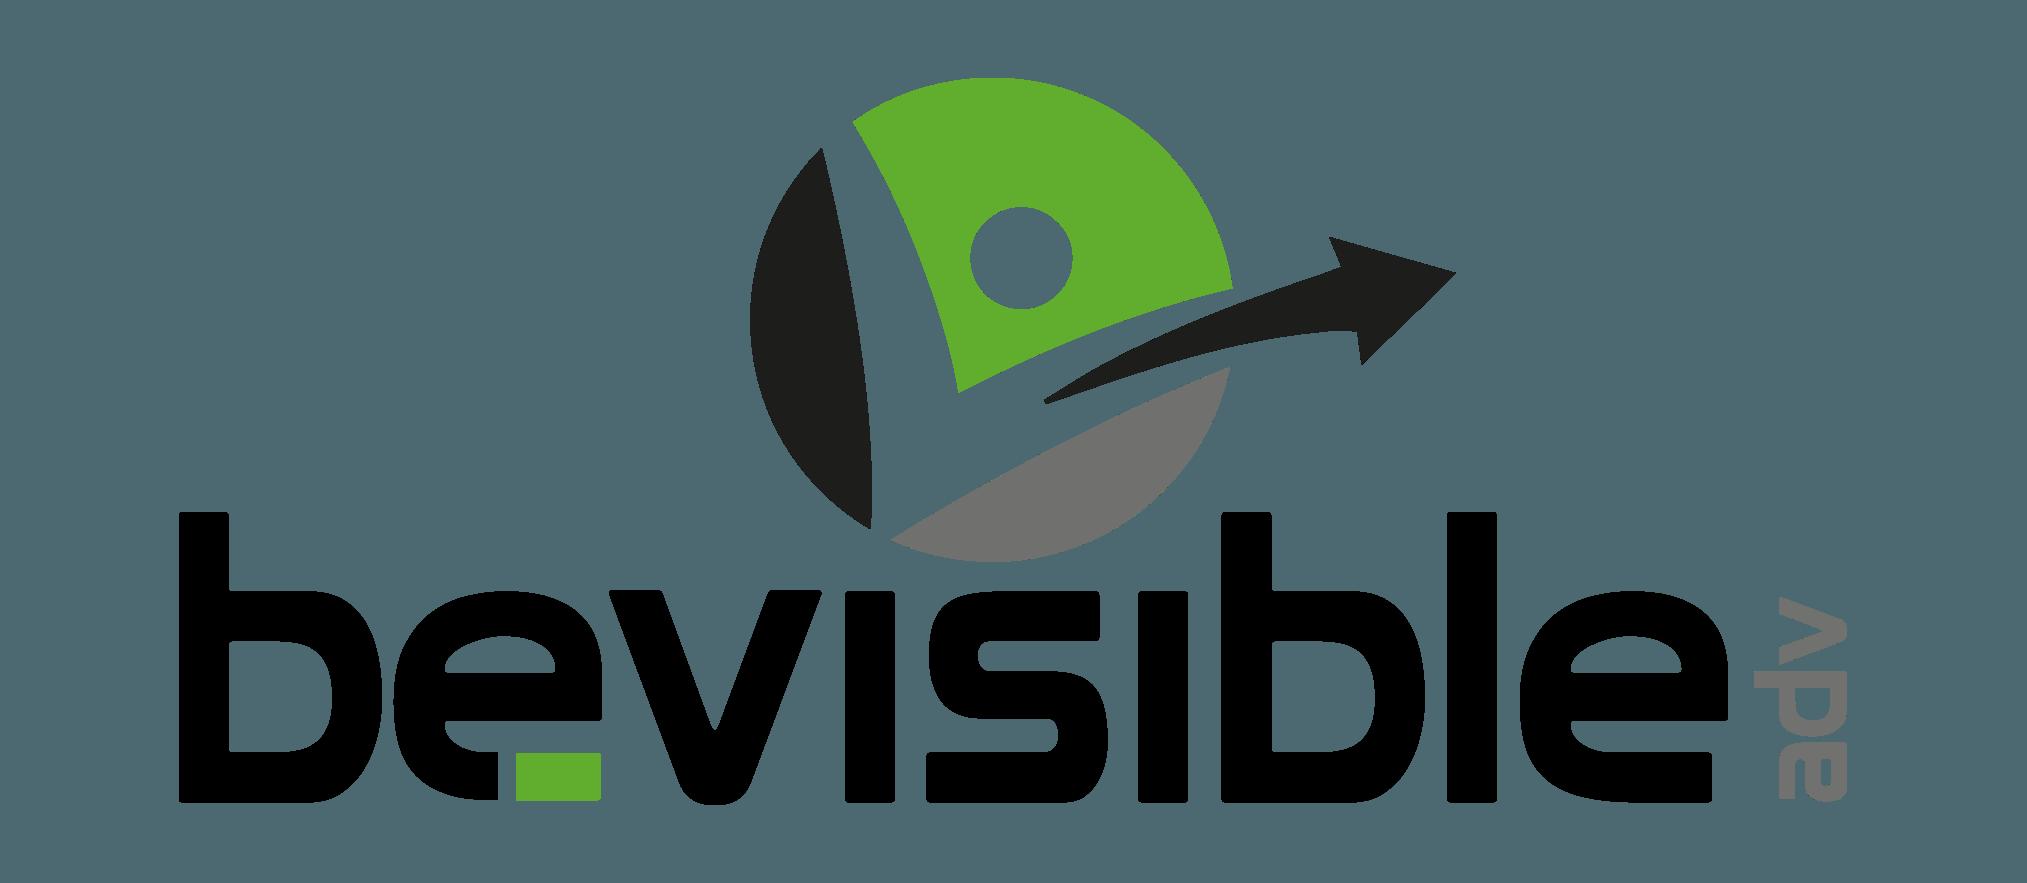 Bevisible Adv